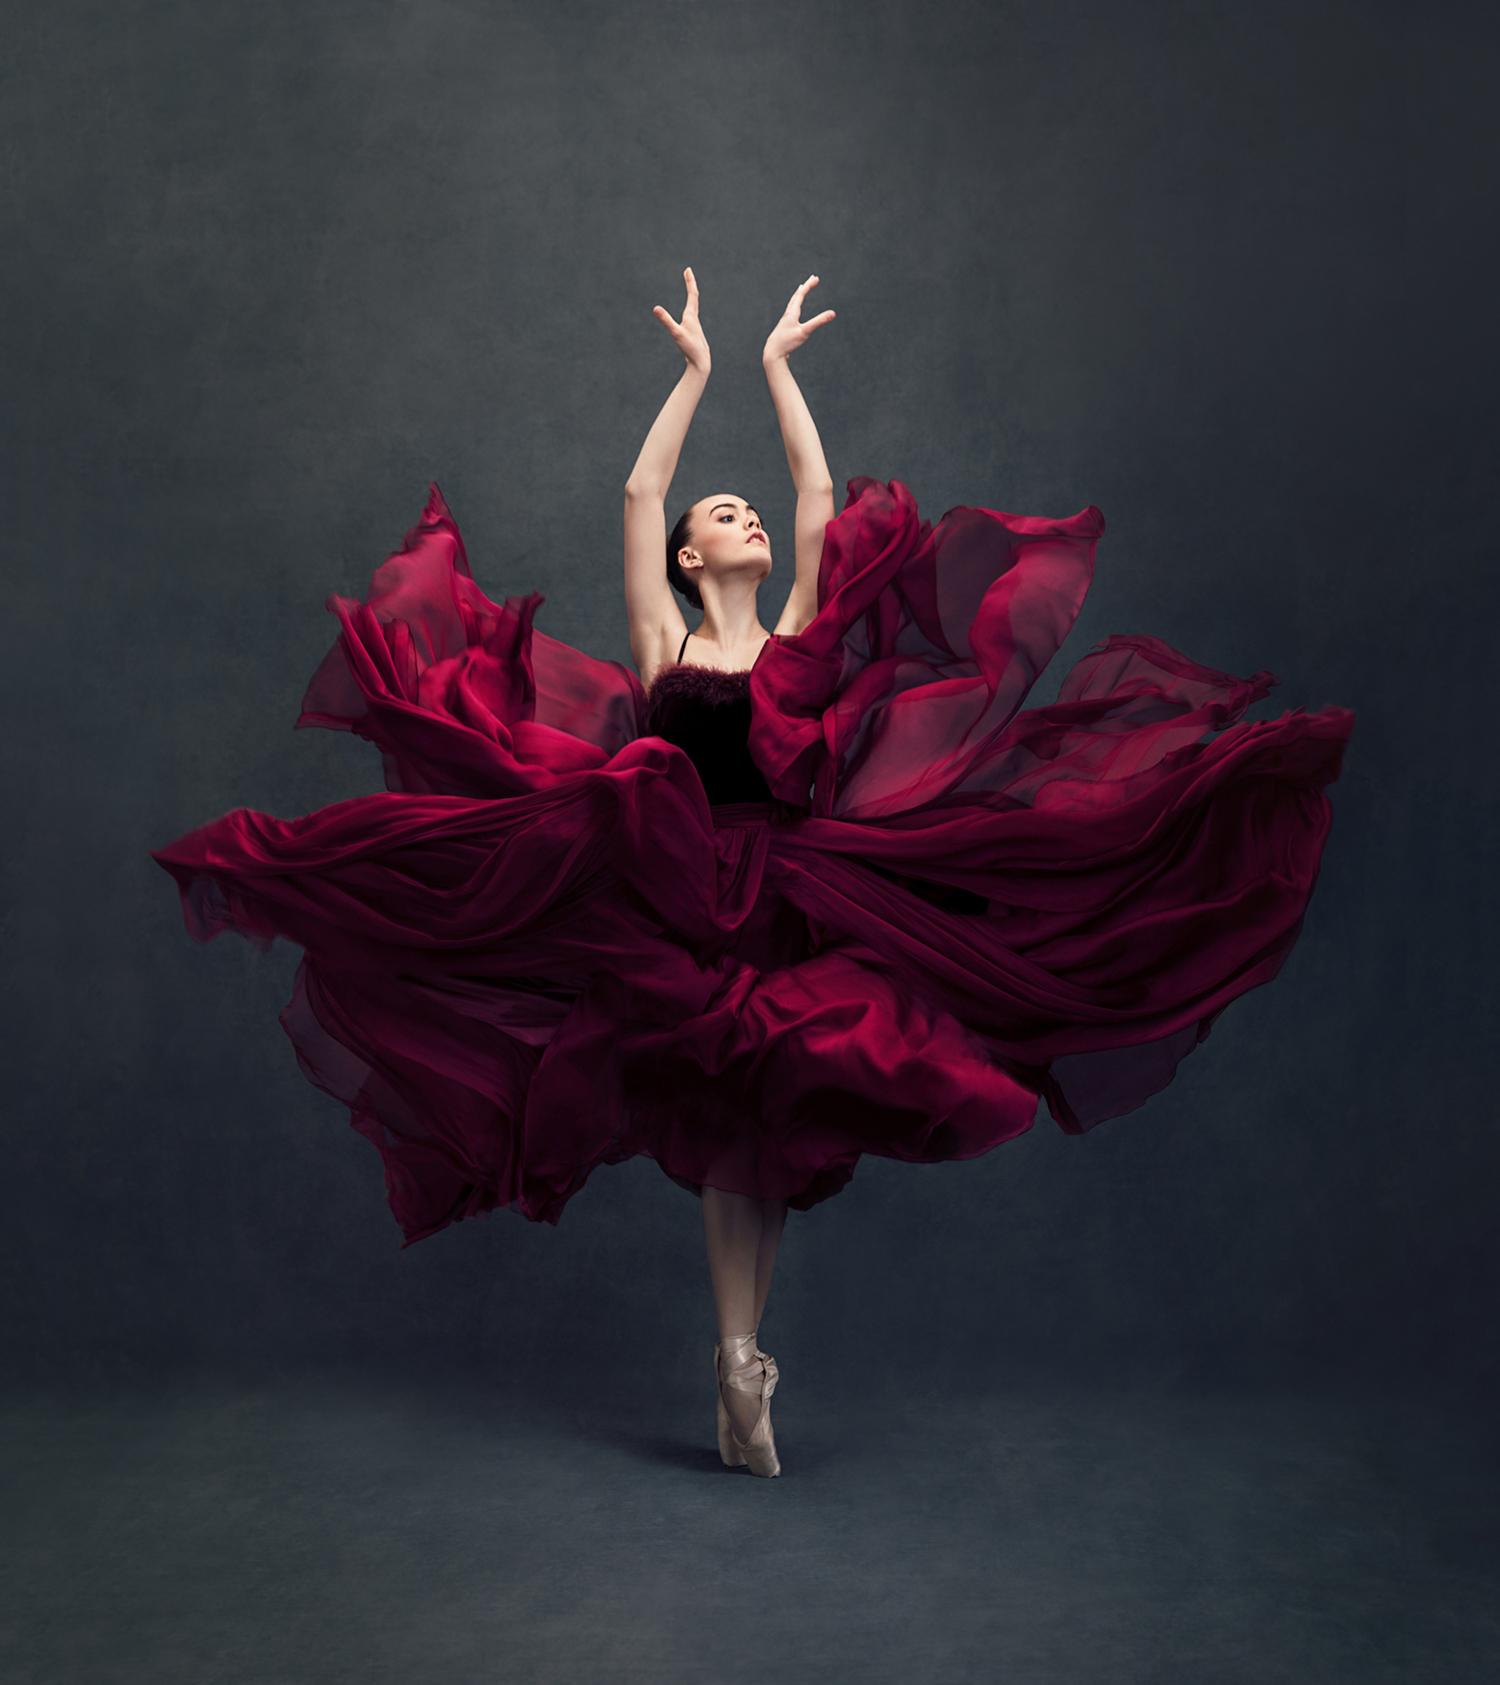 Stunning portrait of ballet dancer by Mayumi Acosta Photography-01.jpg